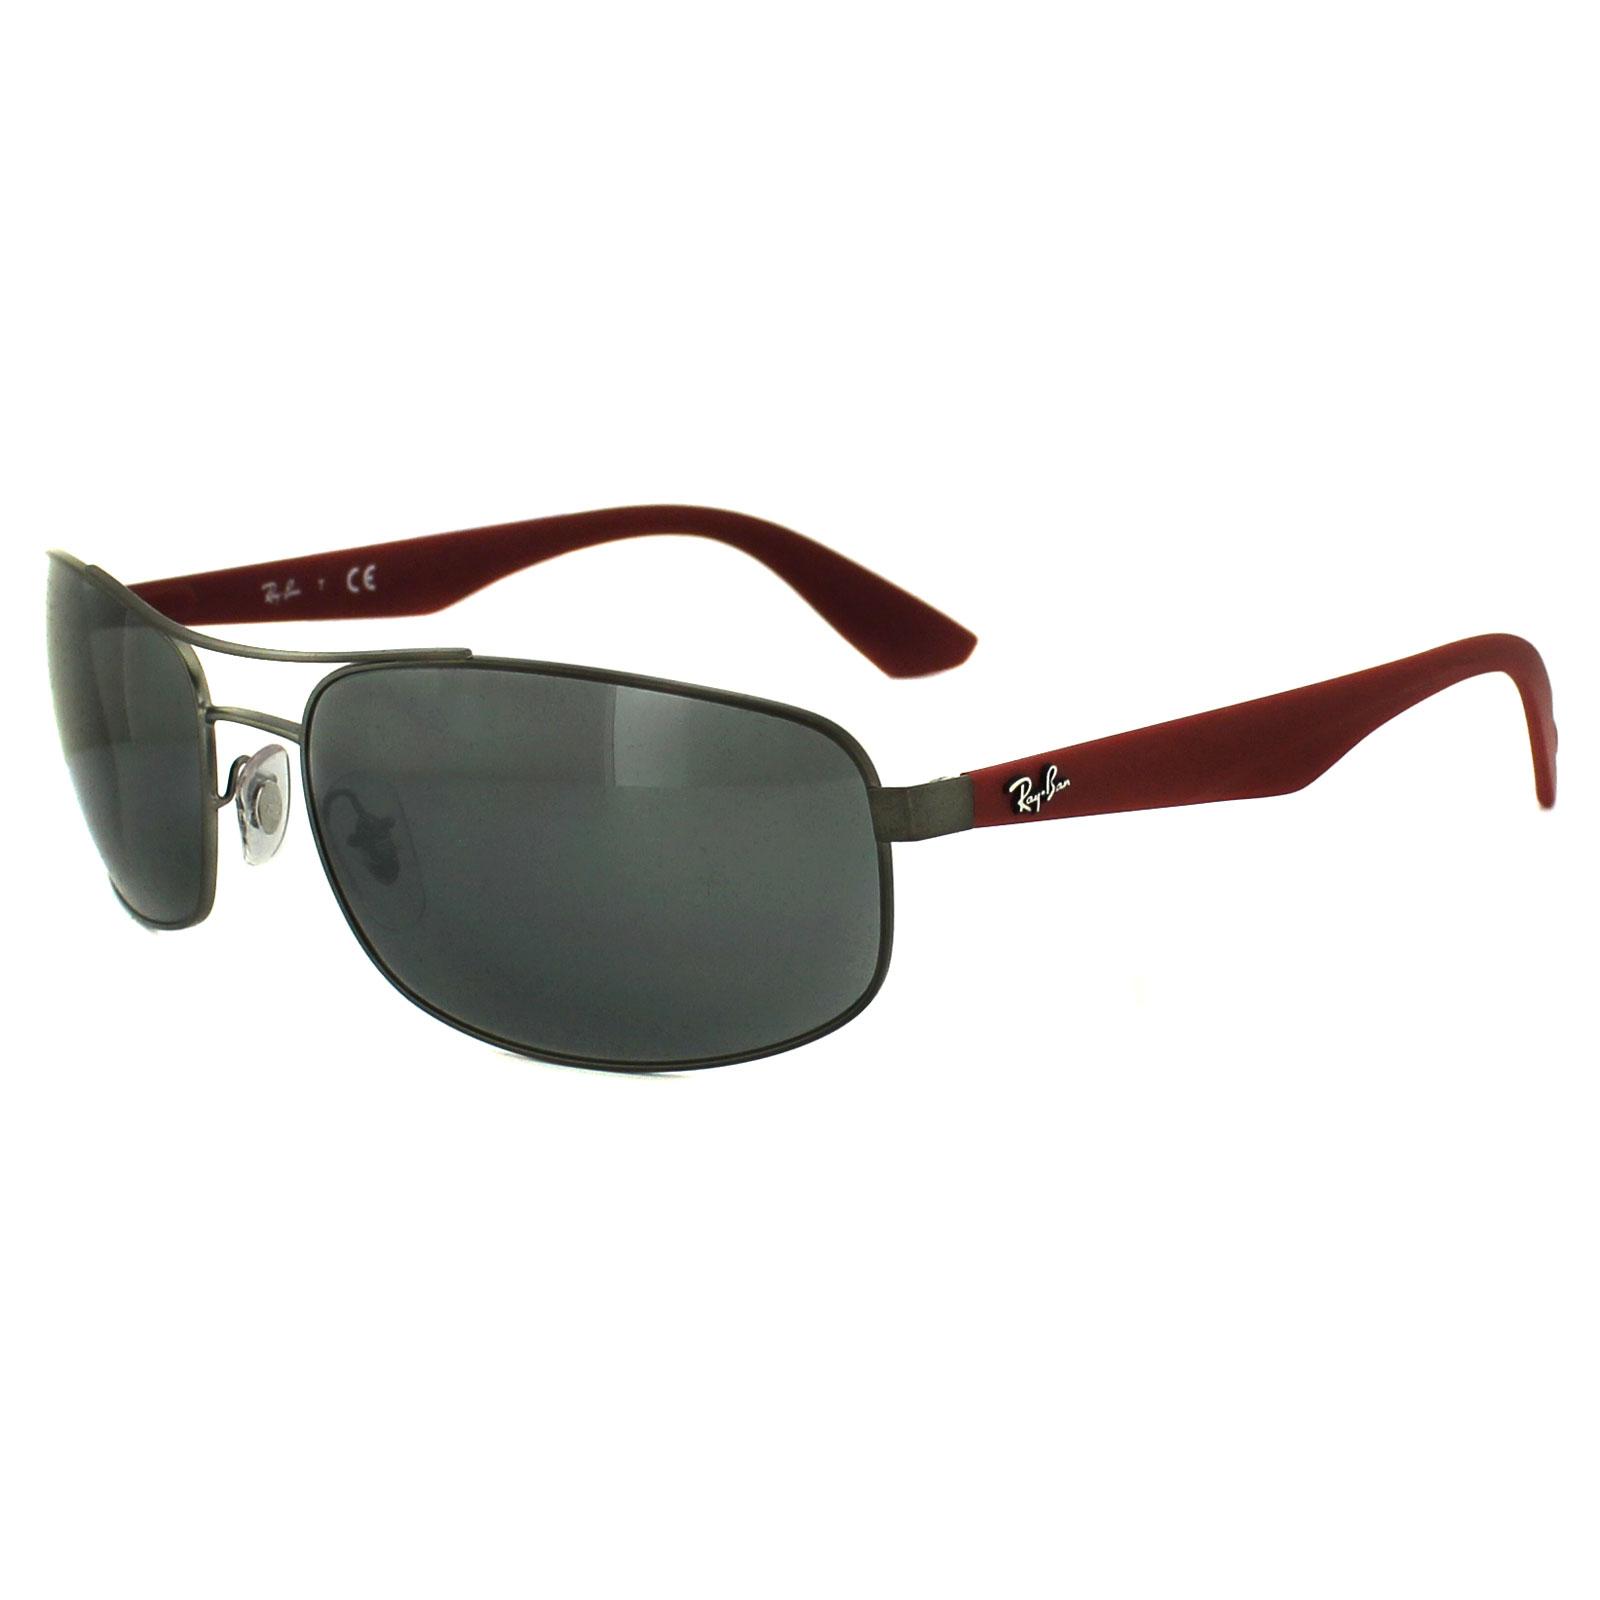 Cheap Ray Ban 3527 Sunglasses Discounted Sunglasses